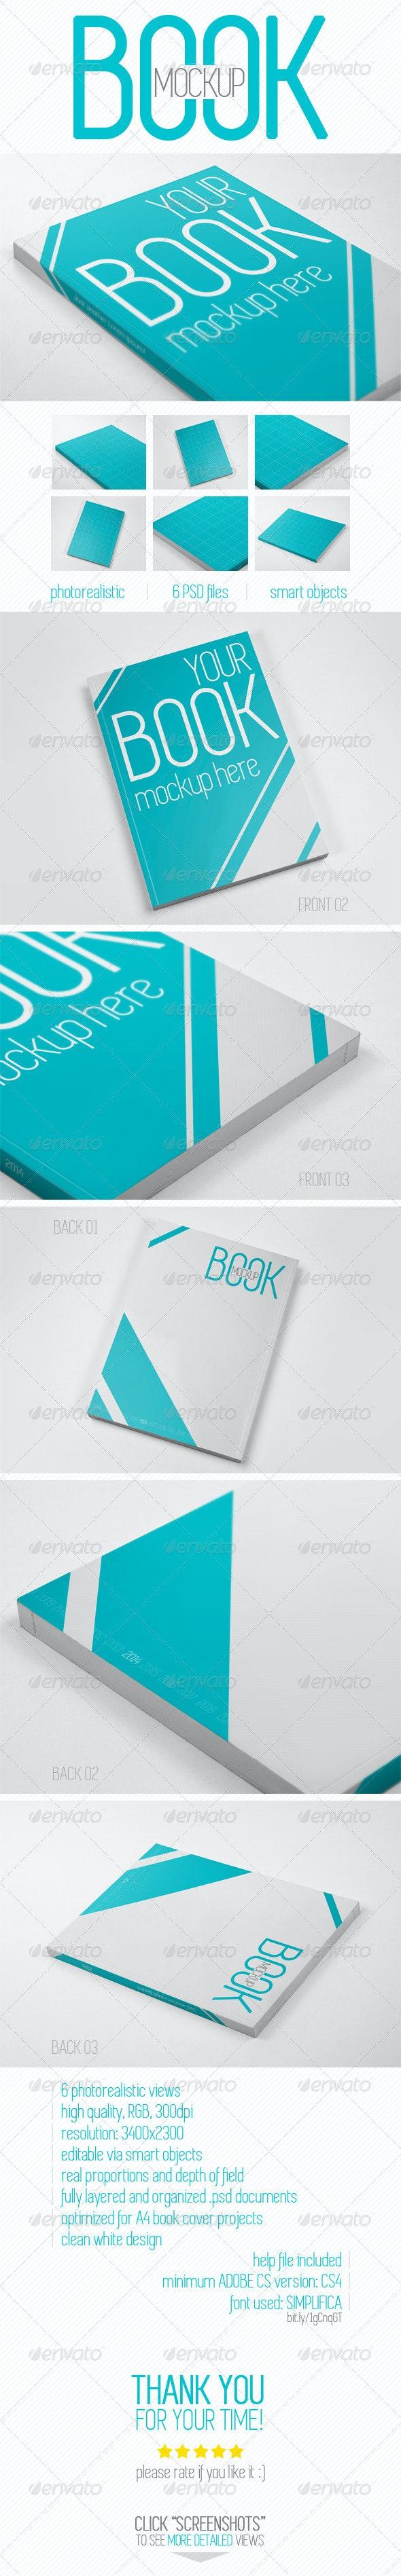 Book Cover Mockup - Books Print